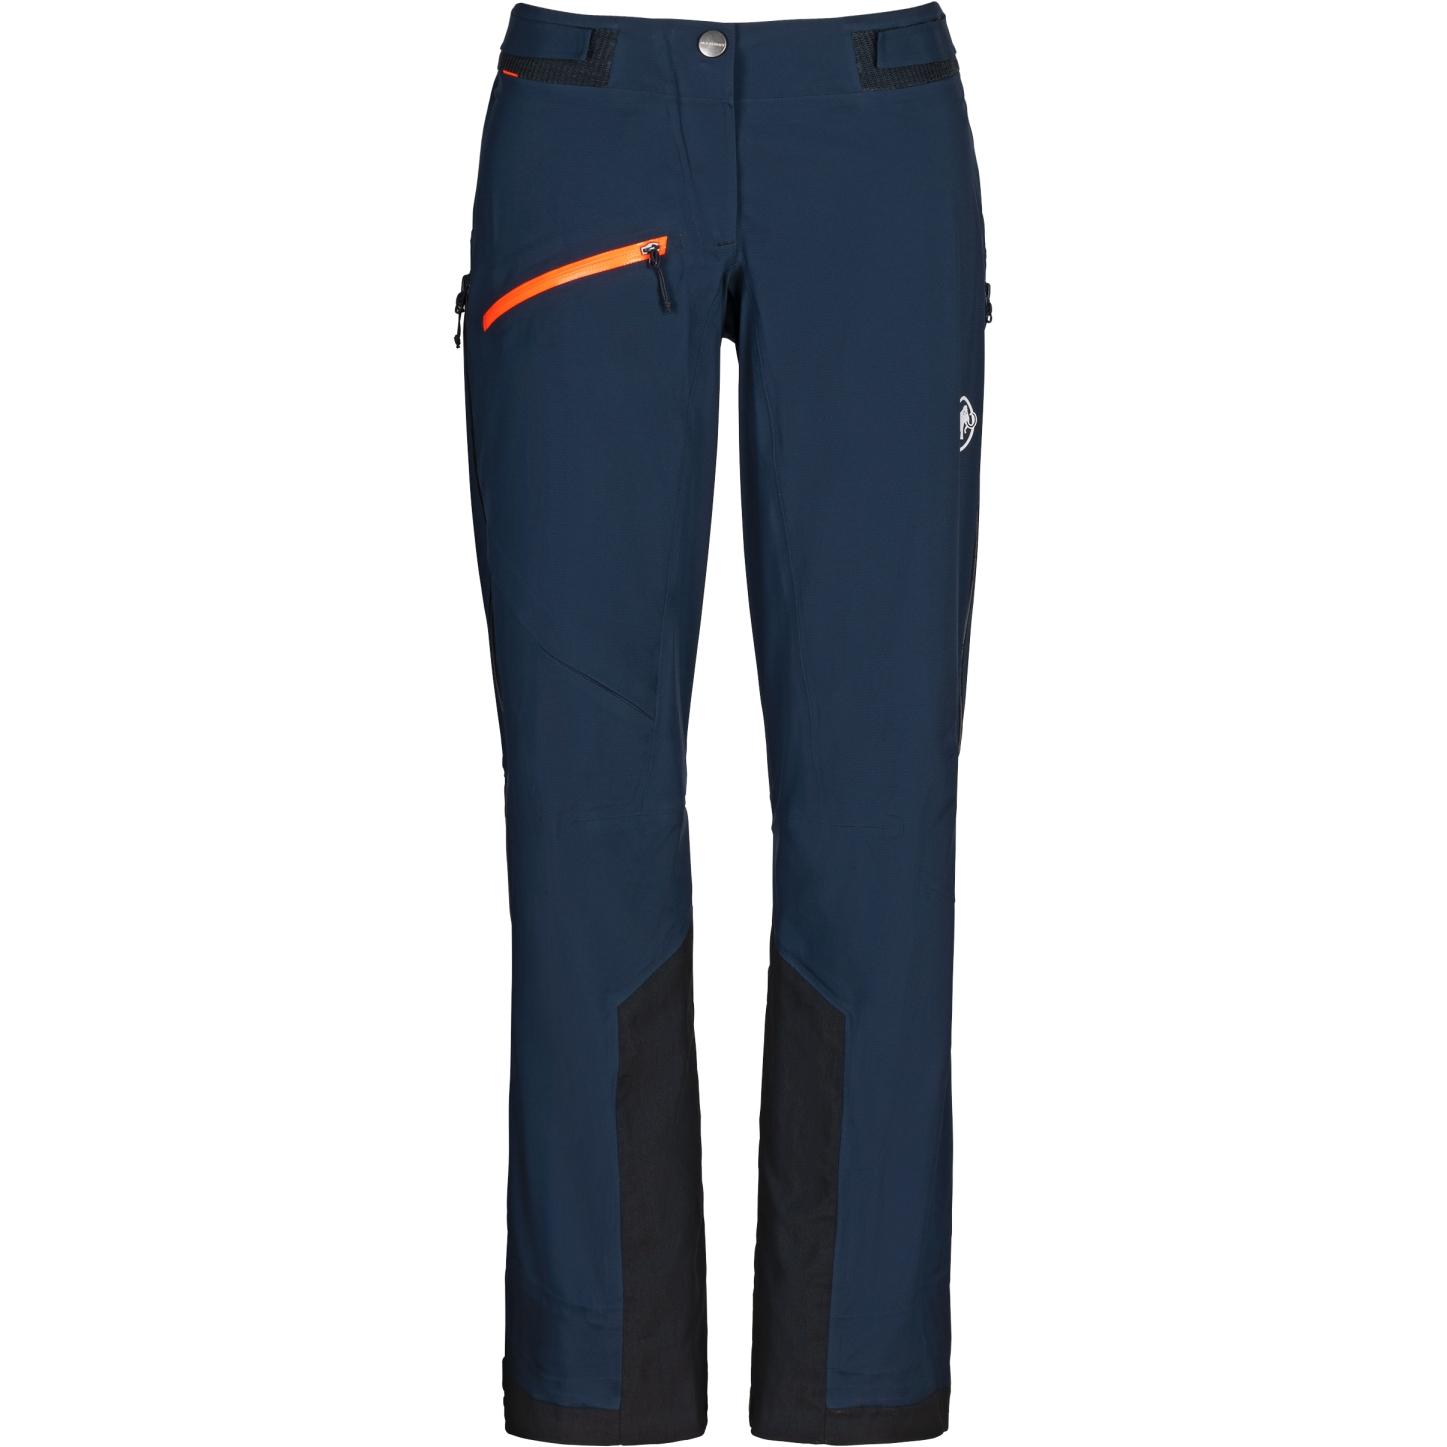 Mammut Aenergy Air Hardshell Pantalones para Mujeres - marine